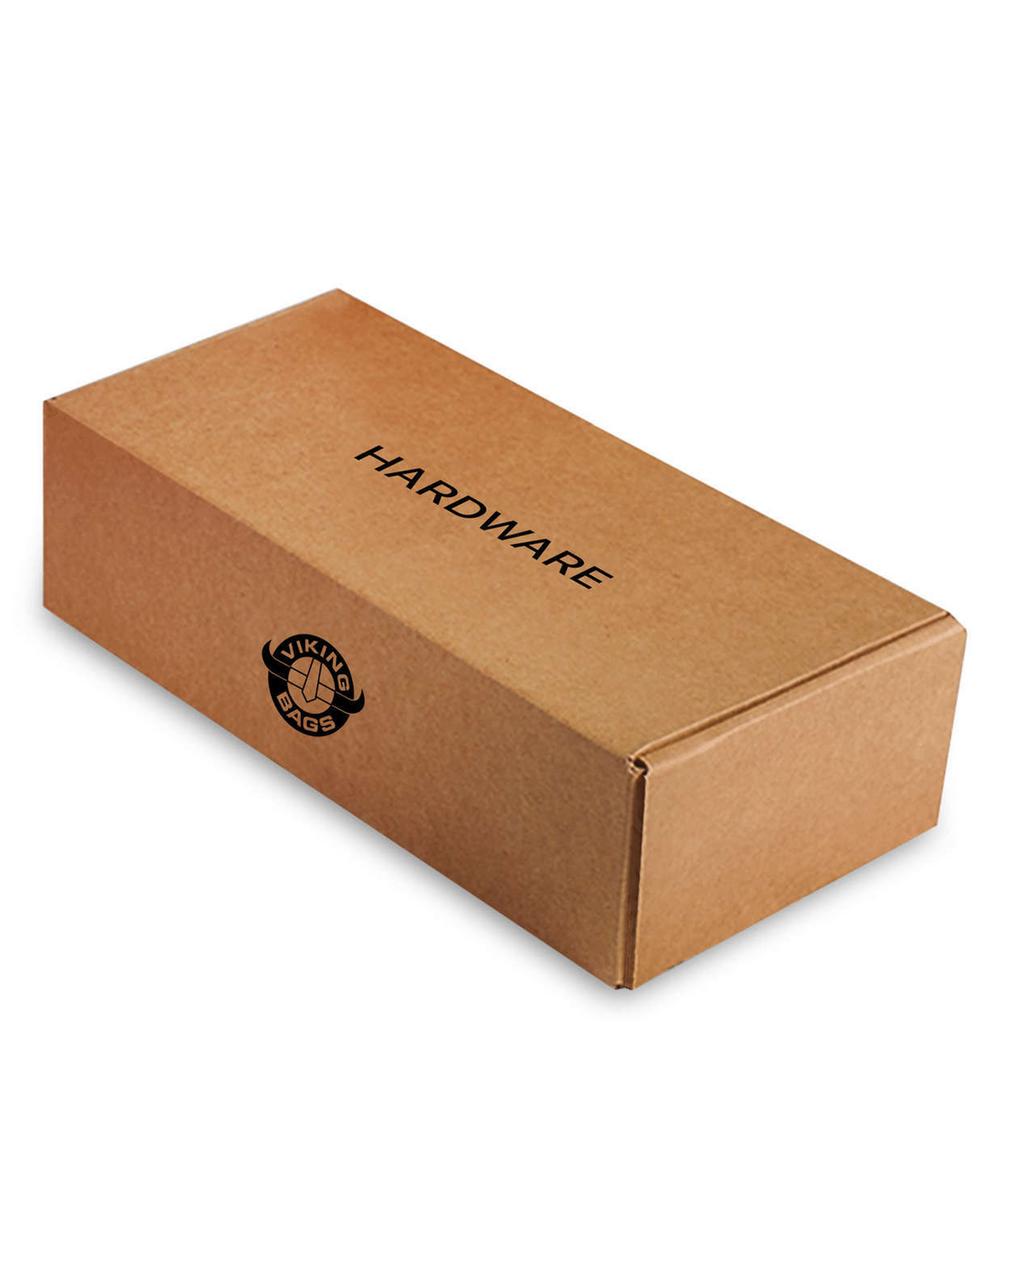 Triumph Rocket III Roadster SS Side Pocket Studded Motorcycle Saddlebags Box